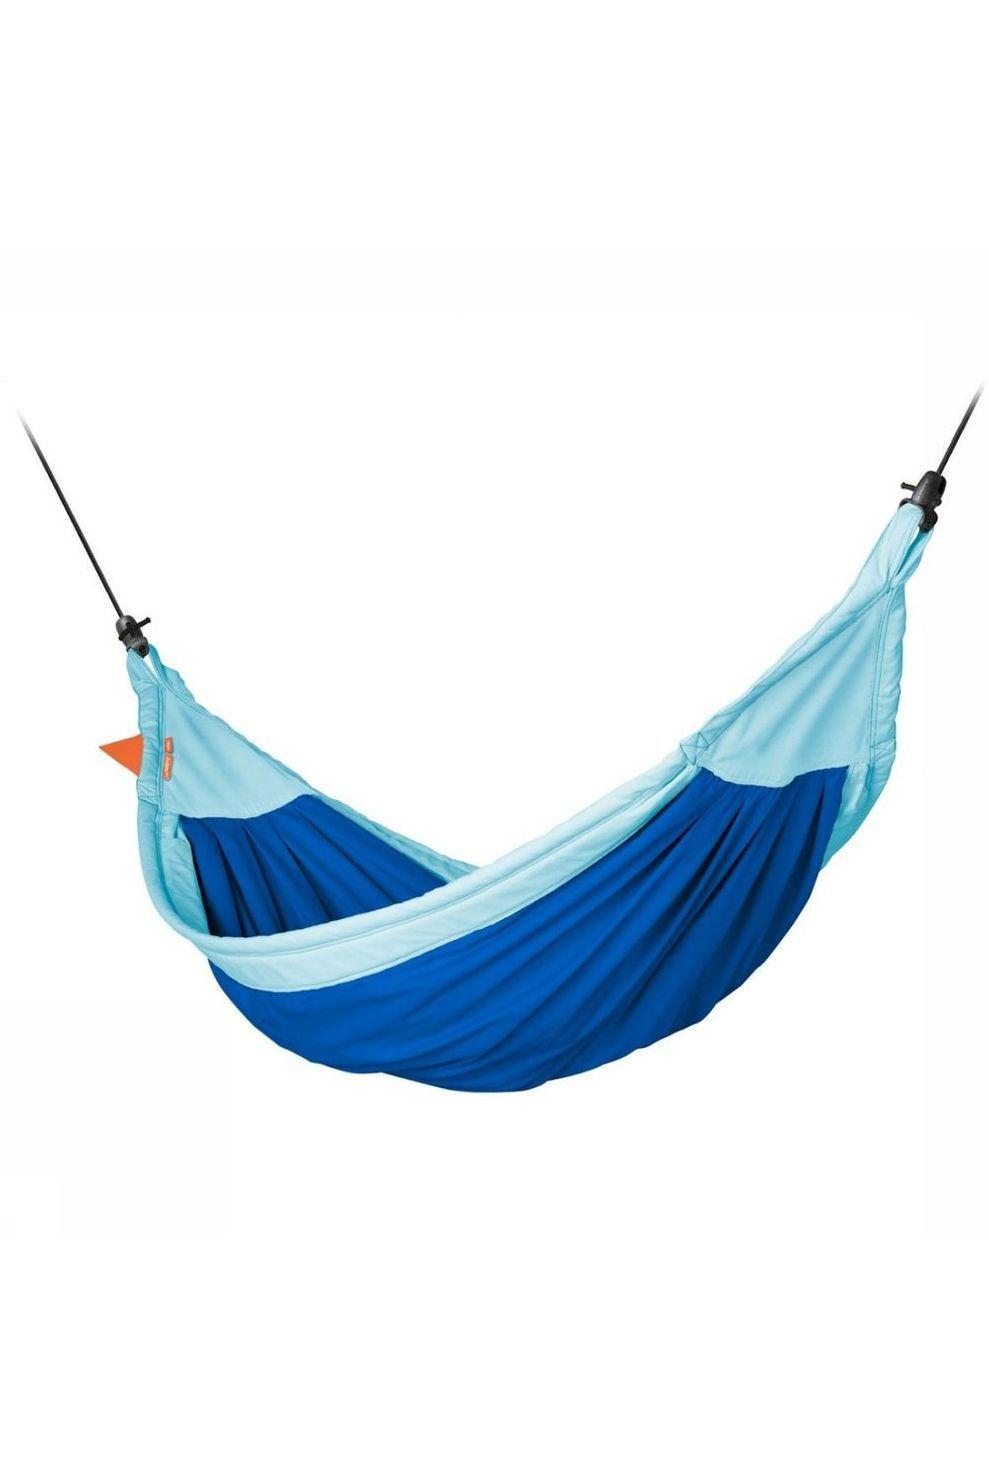 La Siesta Hangmat Moki - Blauw